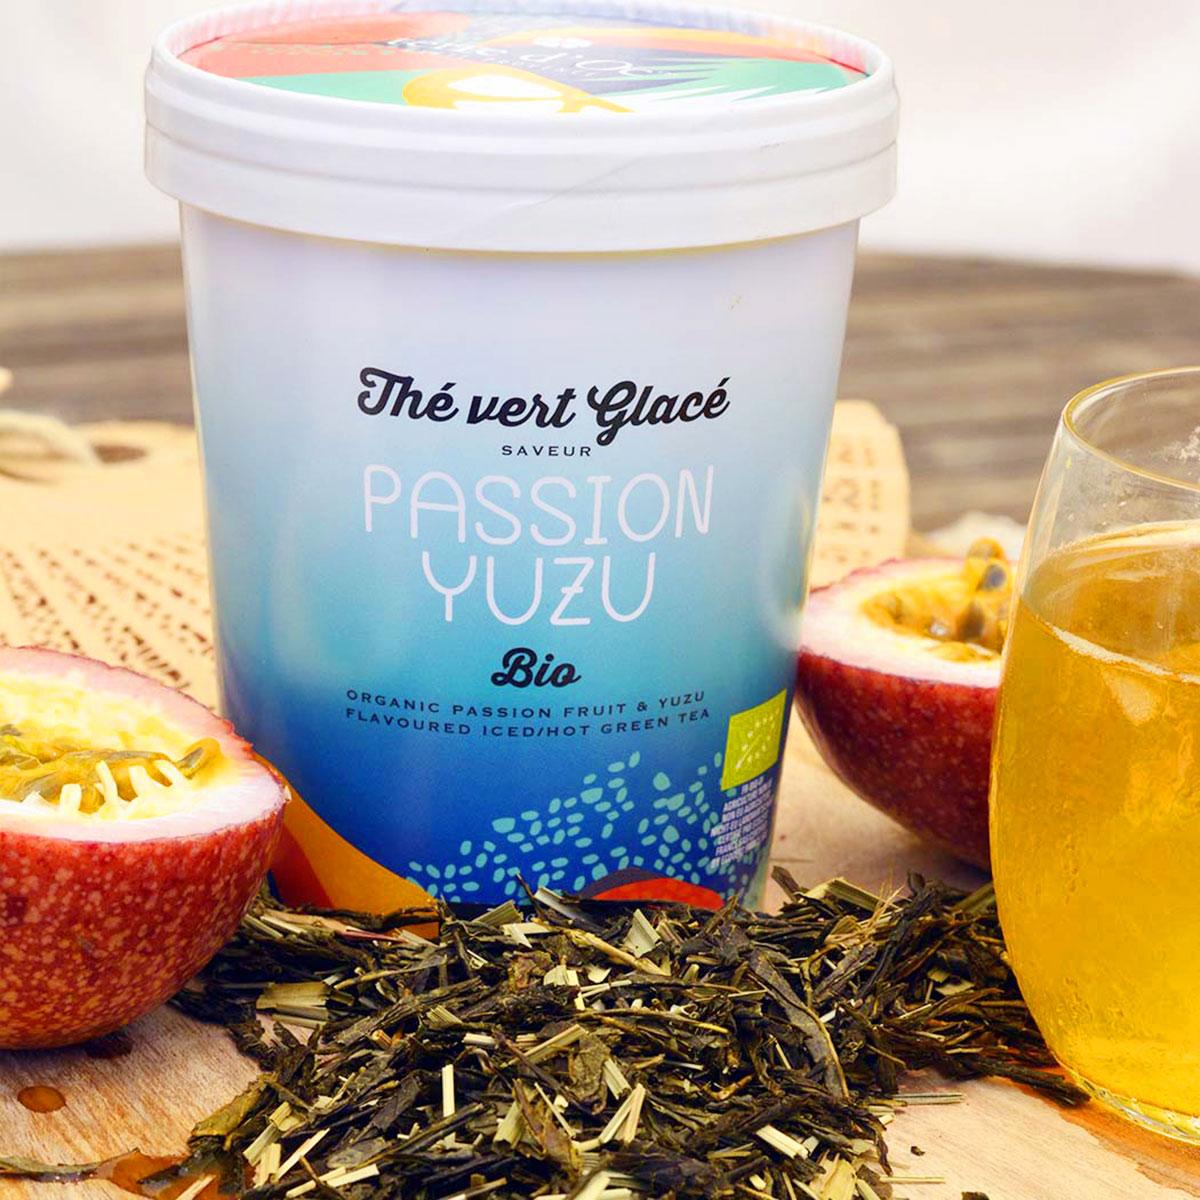 Black Tea/Iced Tea Passion Fruit & Yuzu - Organic